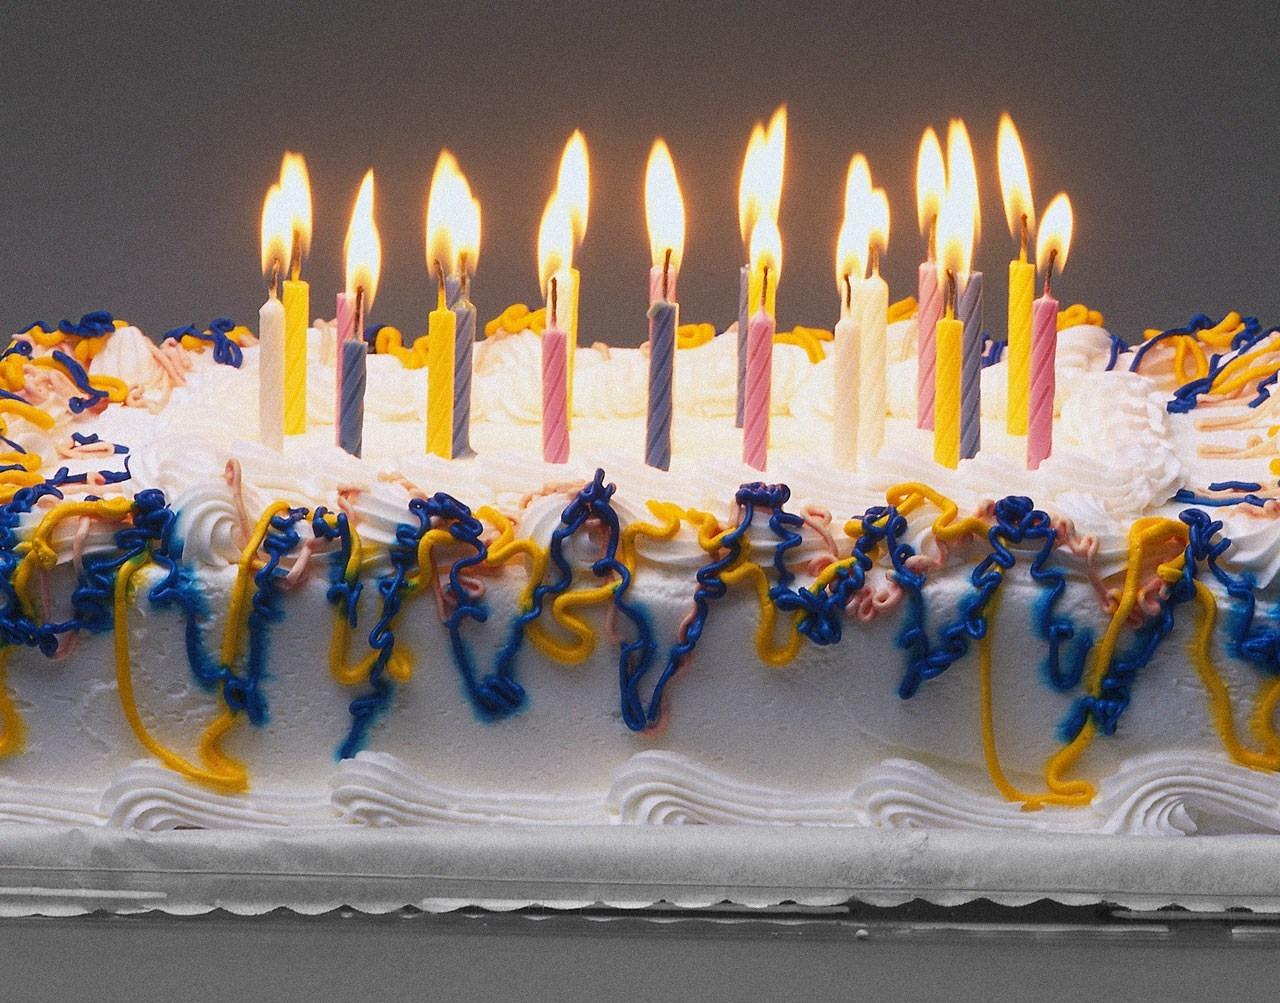 живая картинка торт и свечи чехол